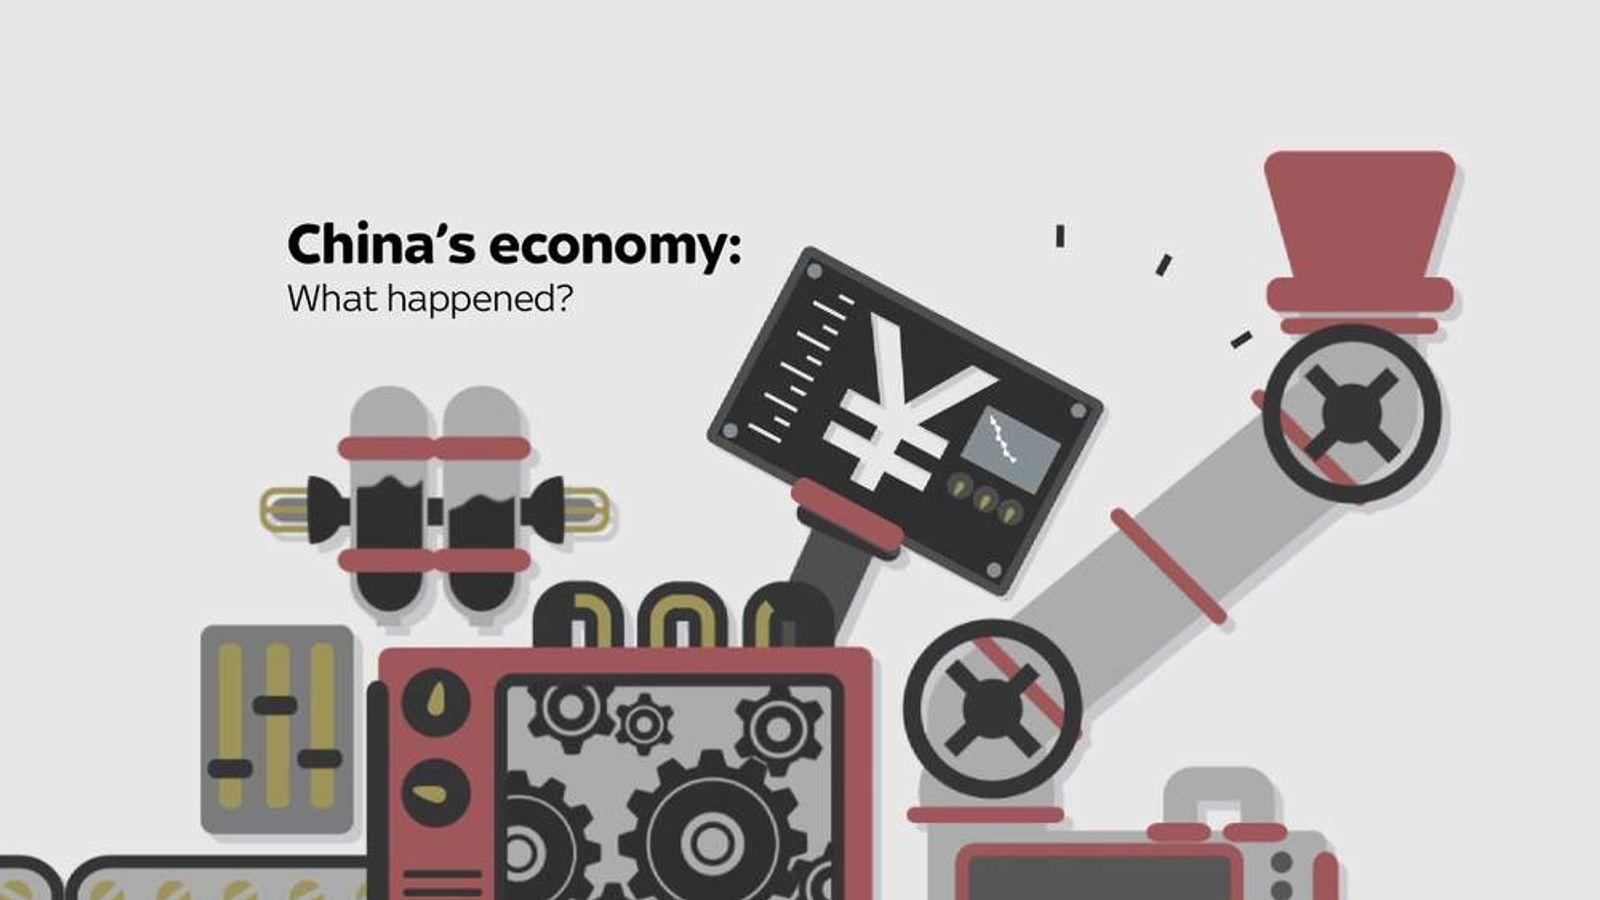 China's economy: What happened?